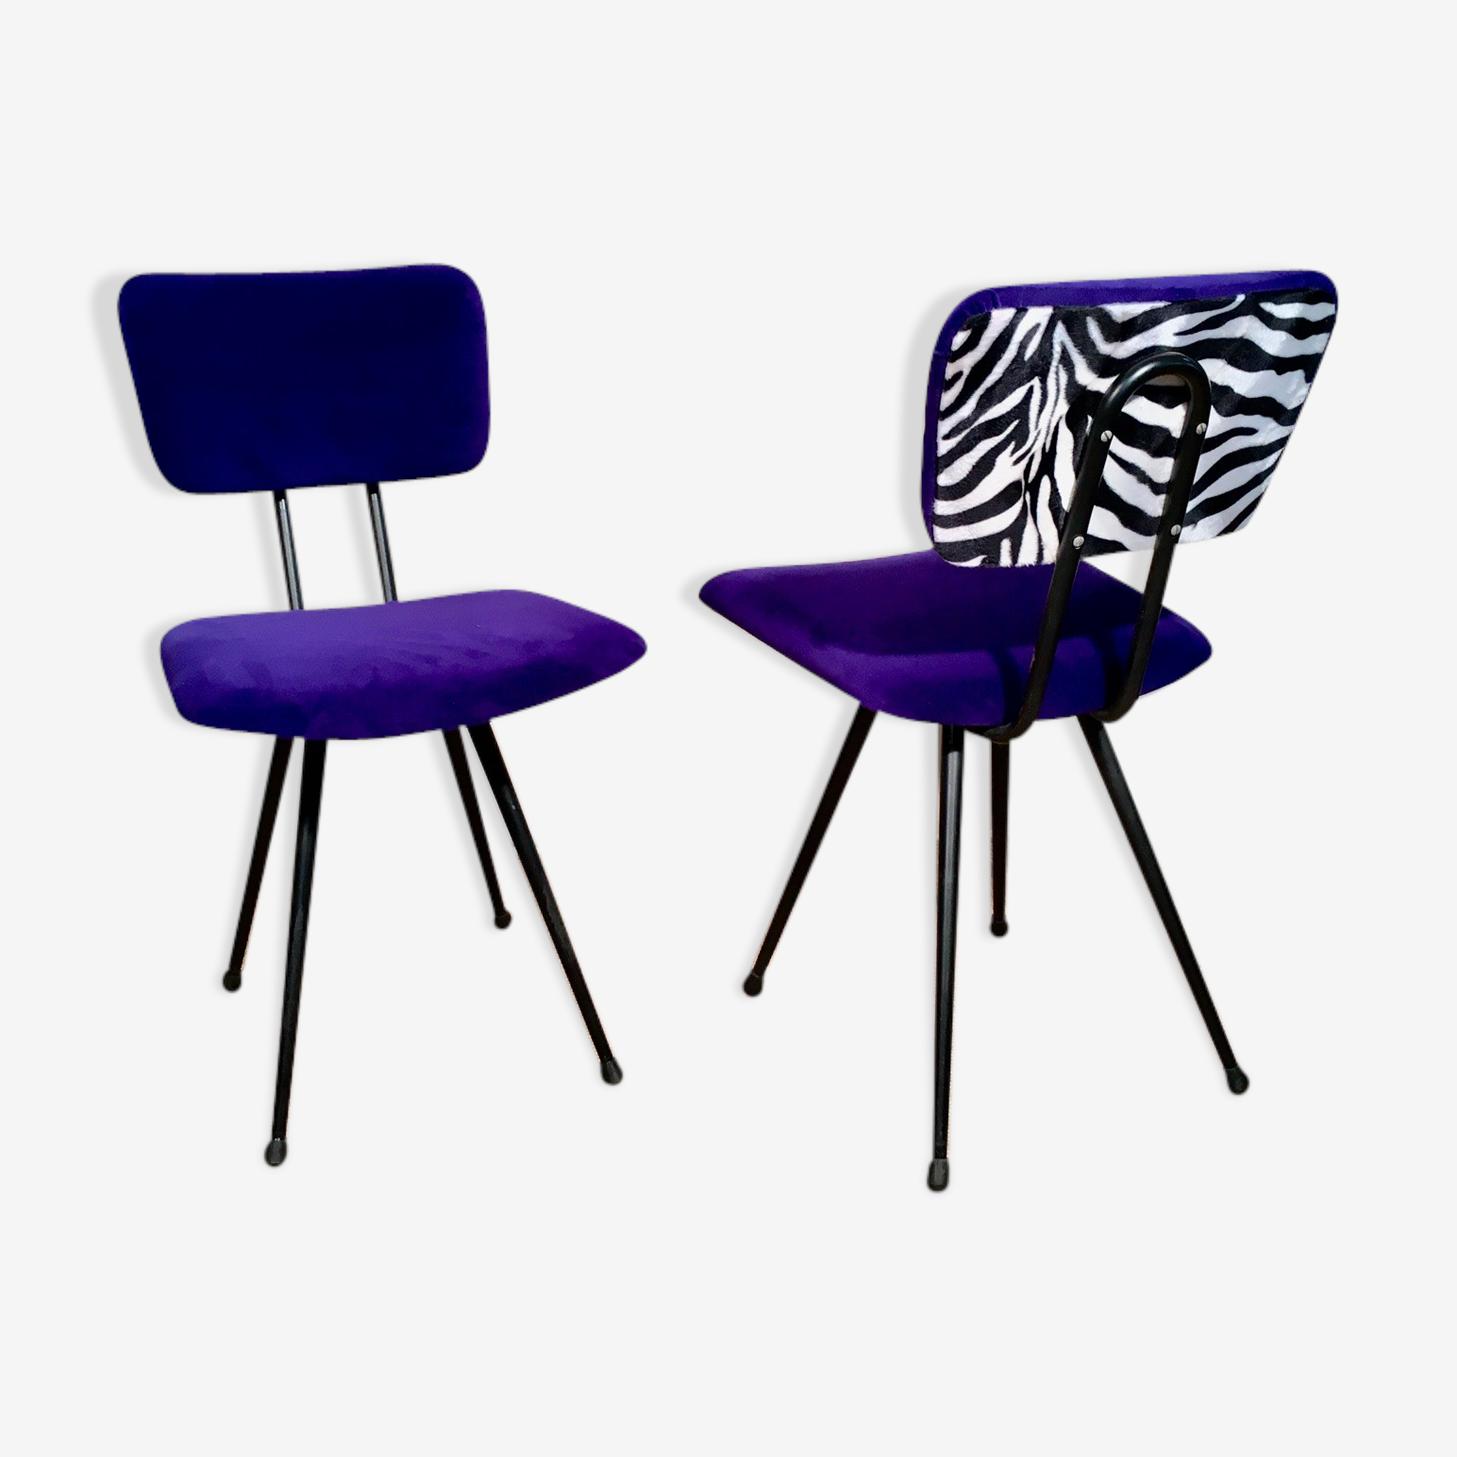 Duo de chaises Stella vers 1950